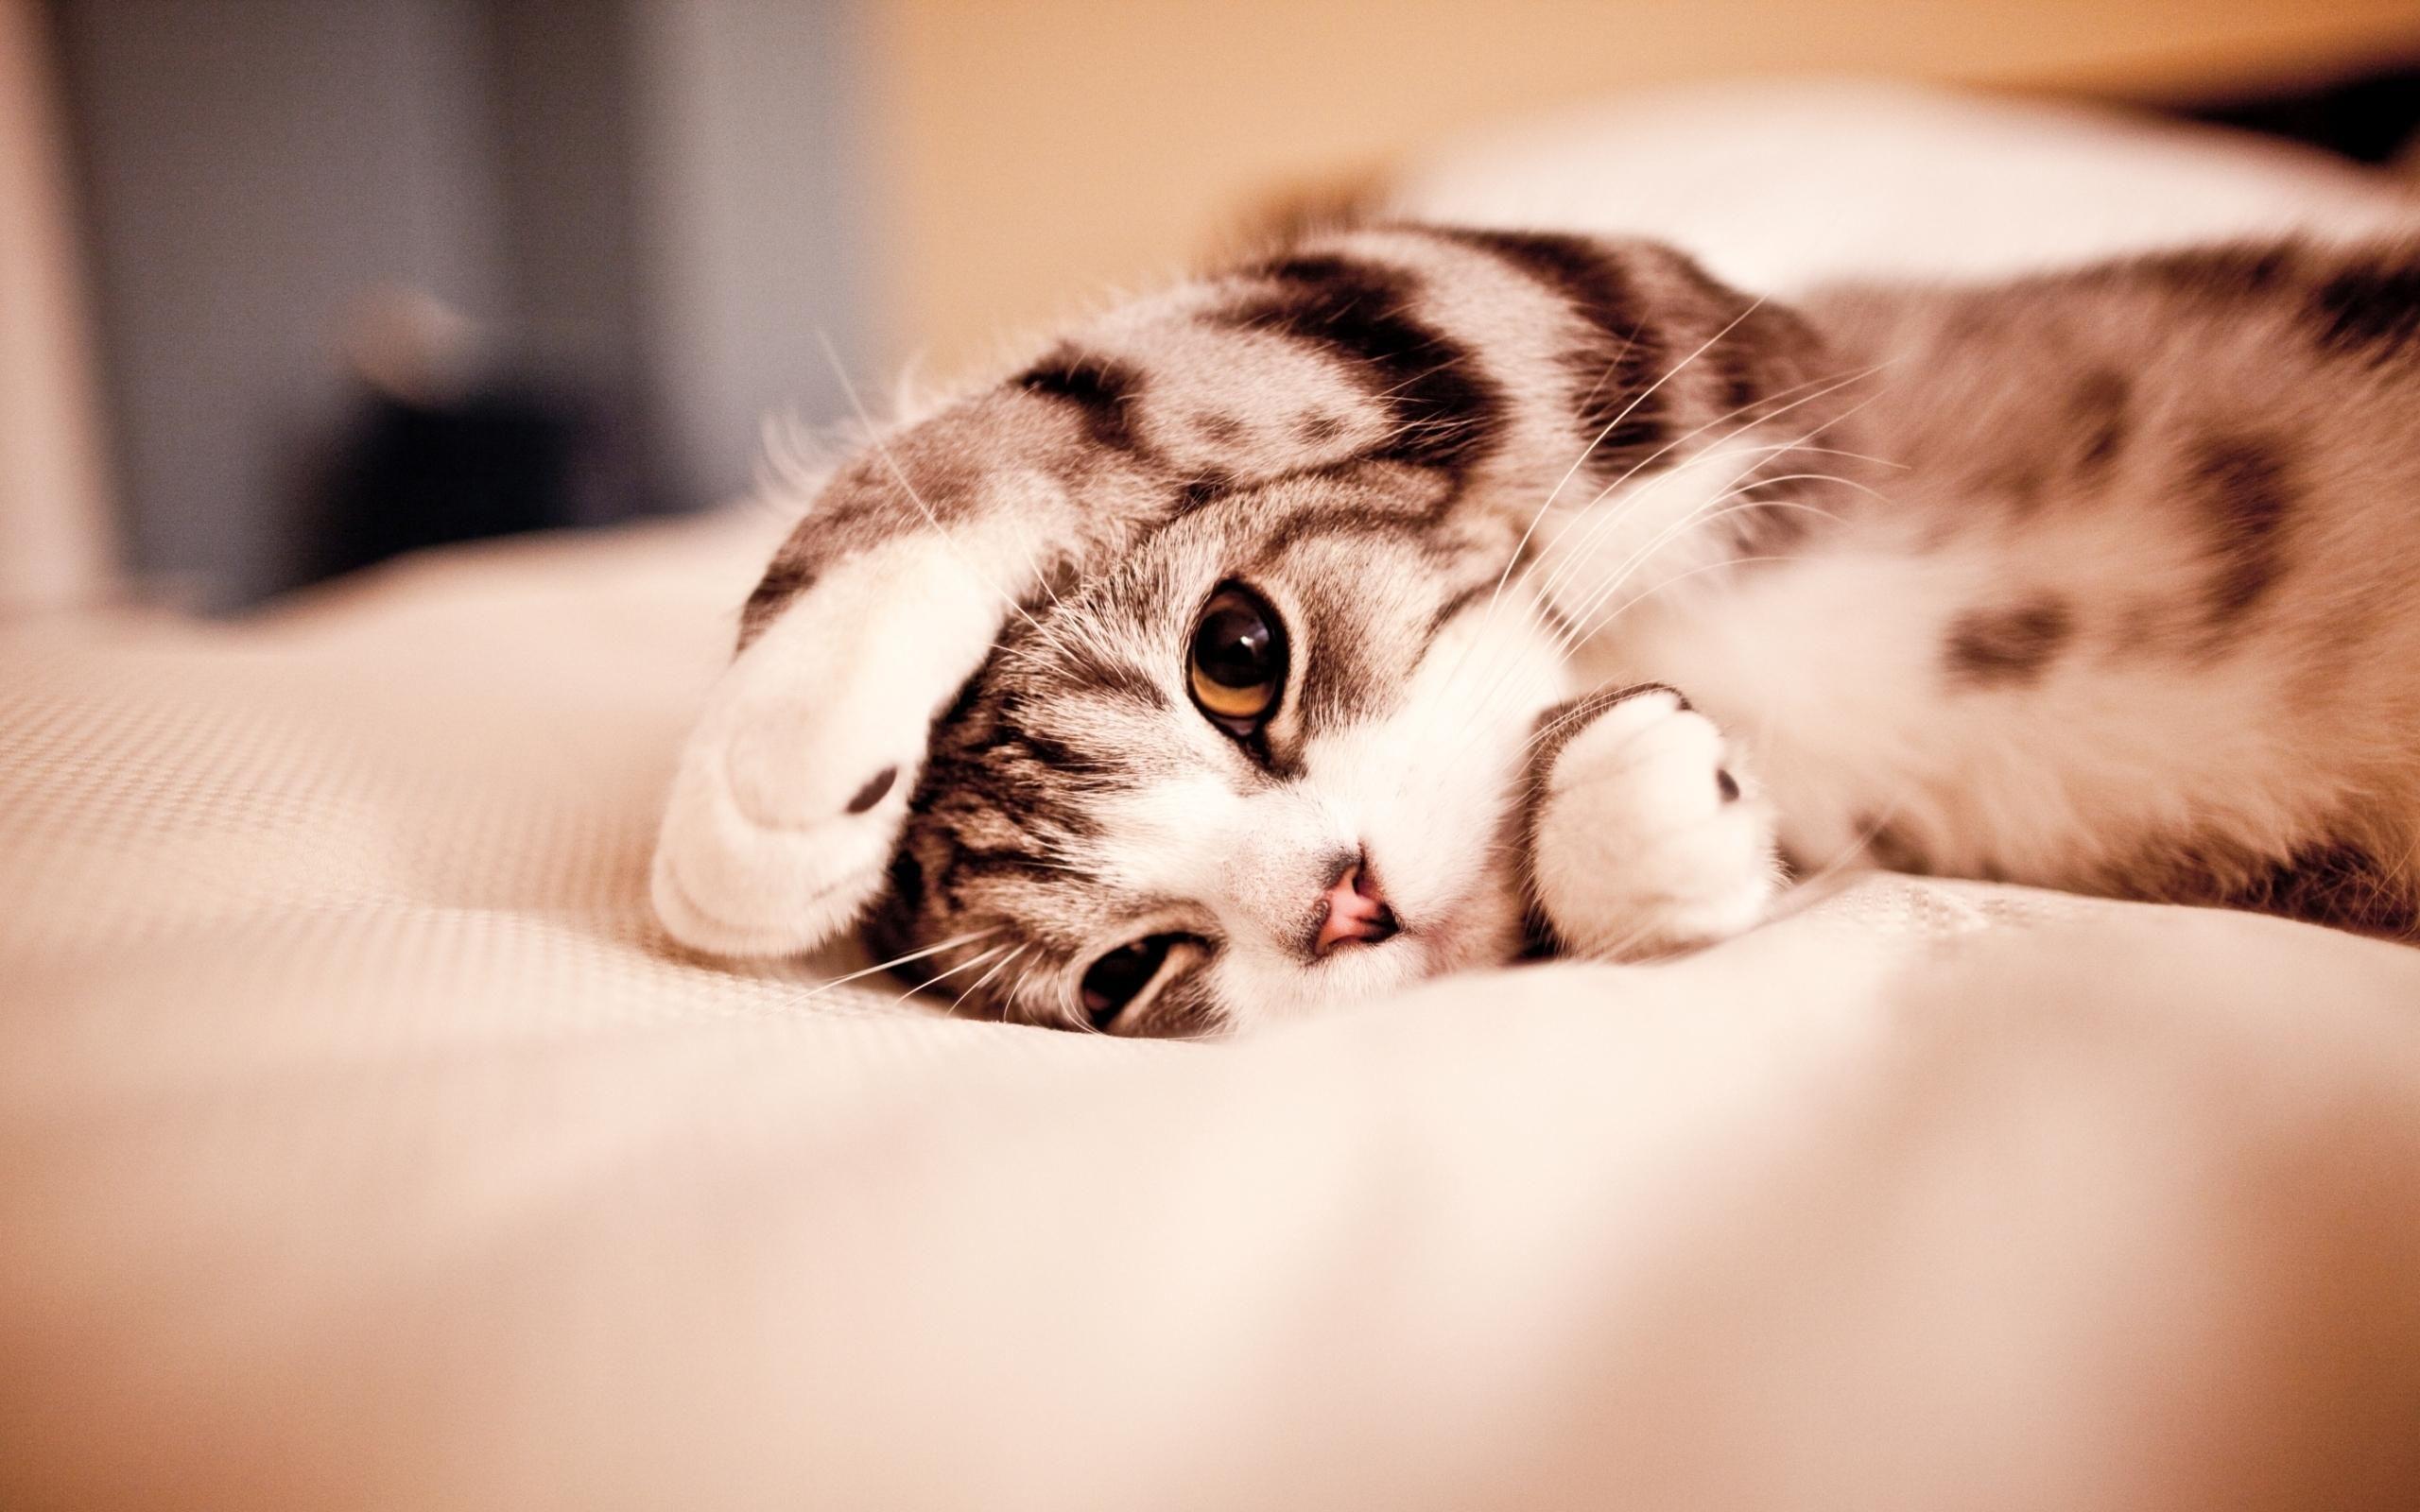 Cute Sleepy Kitten Cute Kitten wallpapers animals